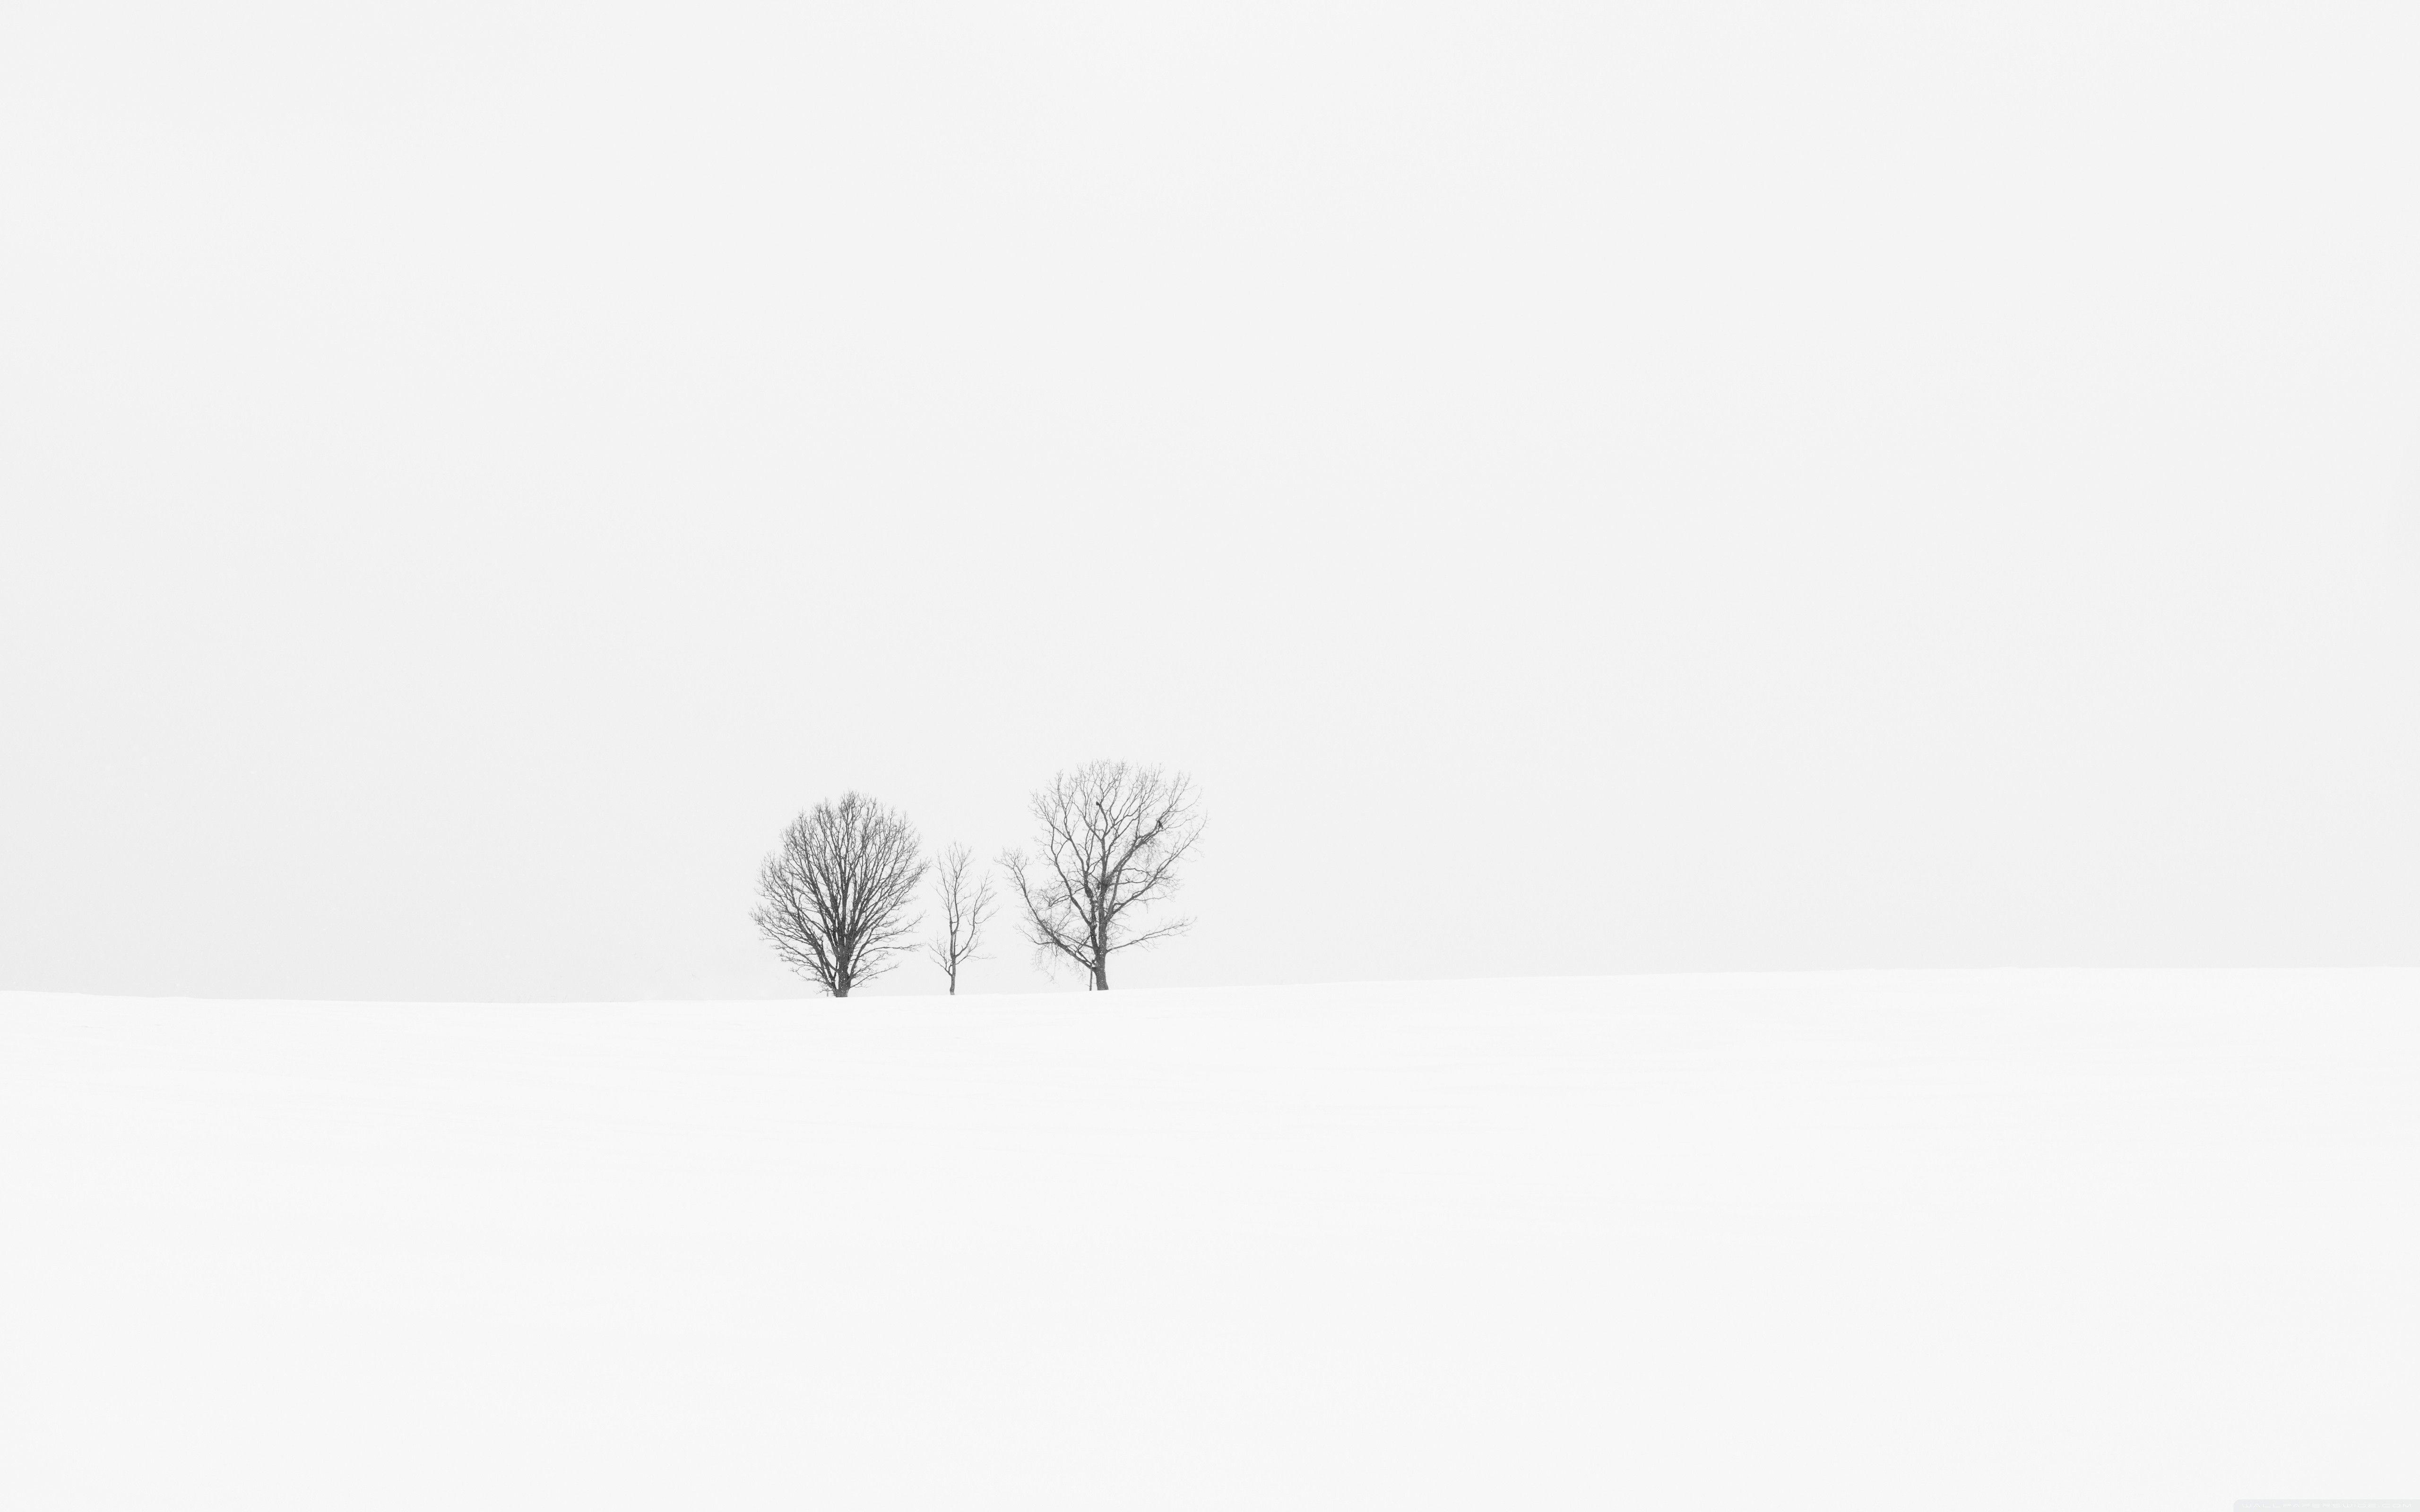 Free download White Minimalist Desktop Wallpapers Top White ...